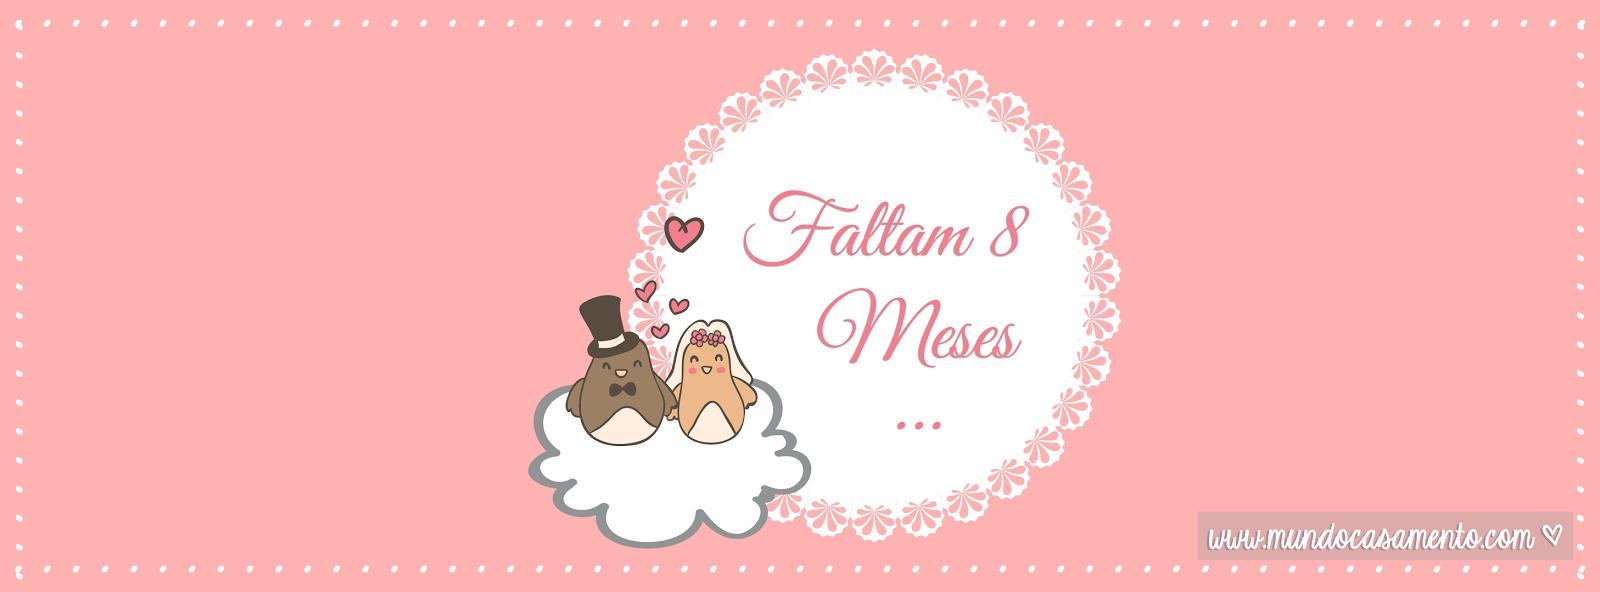 capa para facebook noivas - contagem regressiva casamento - mundo casamento